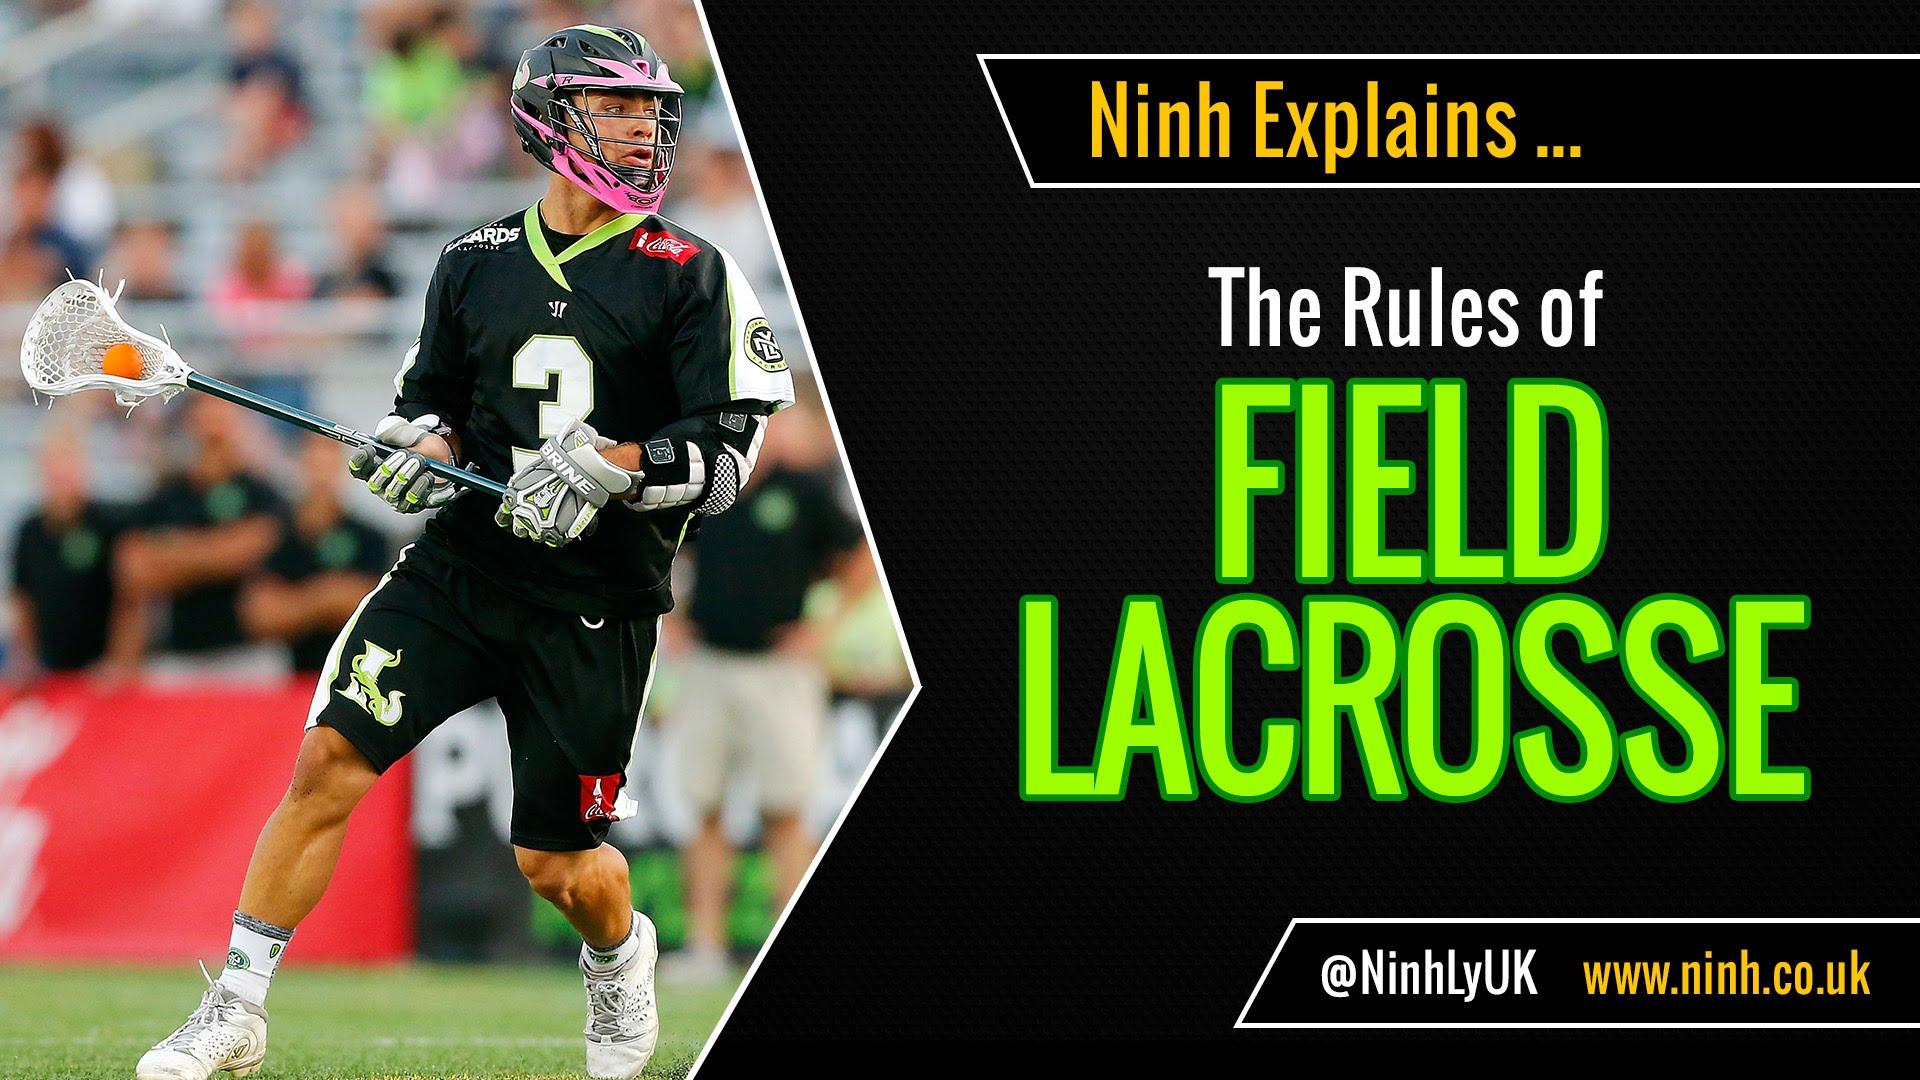 Lacrosse - Rules